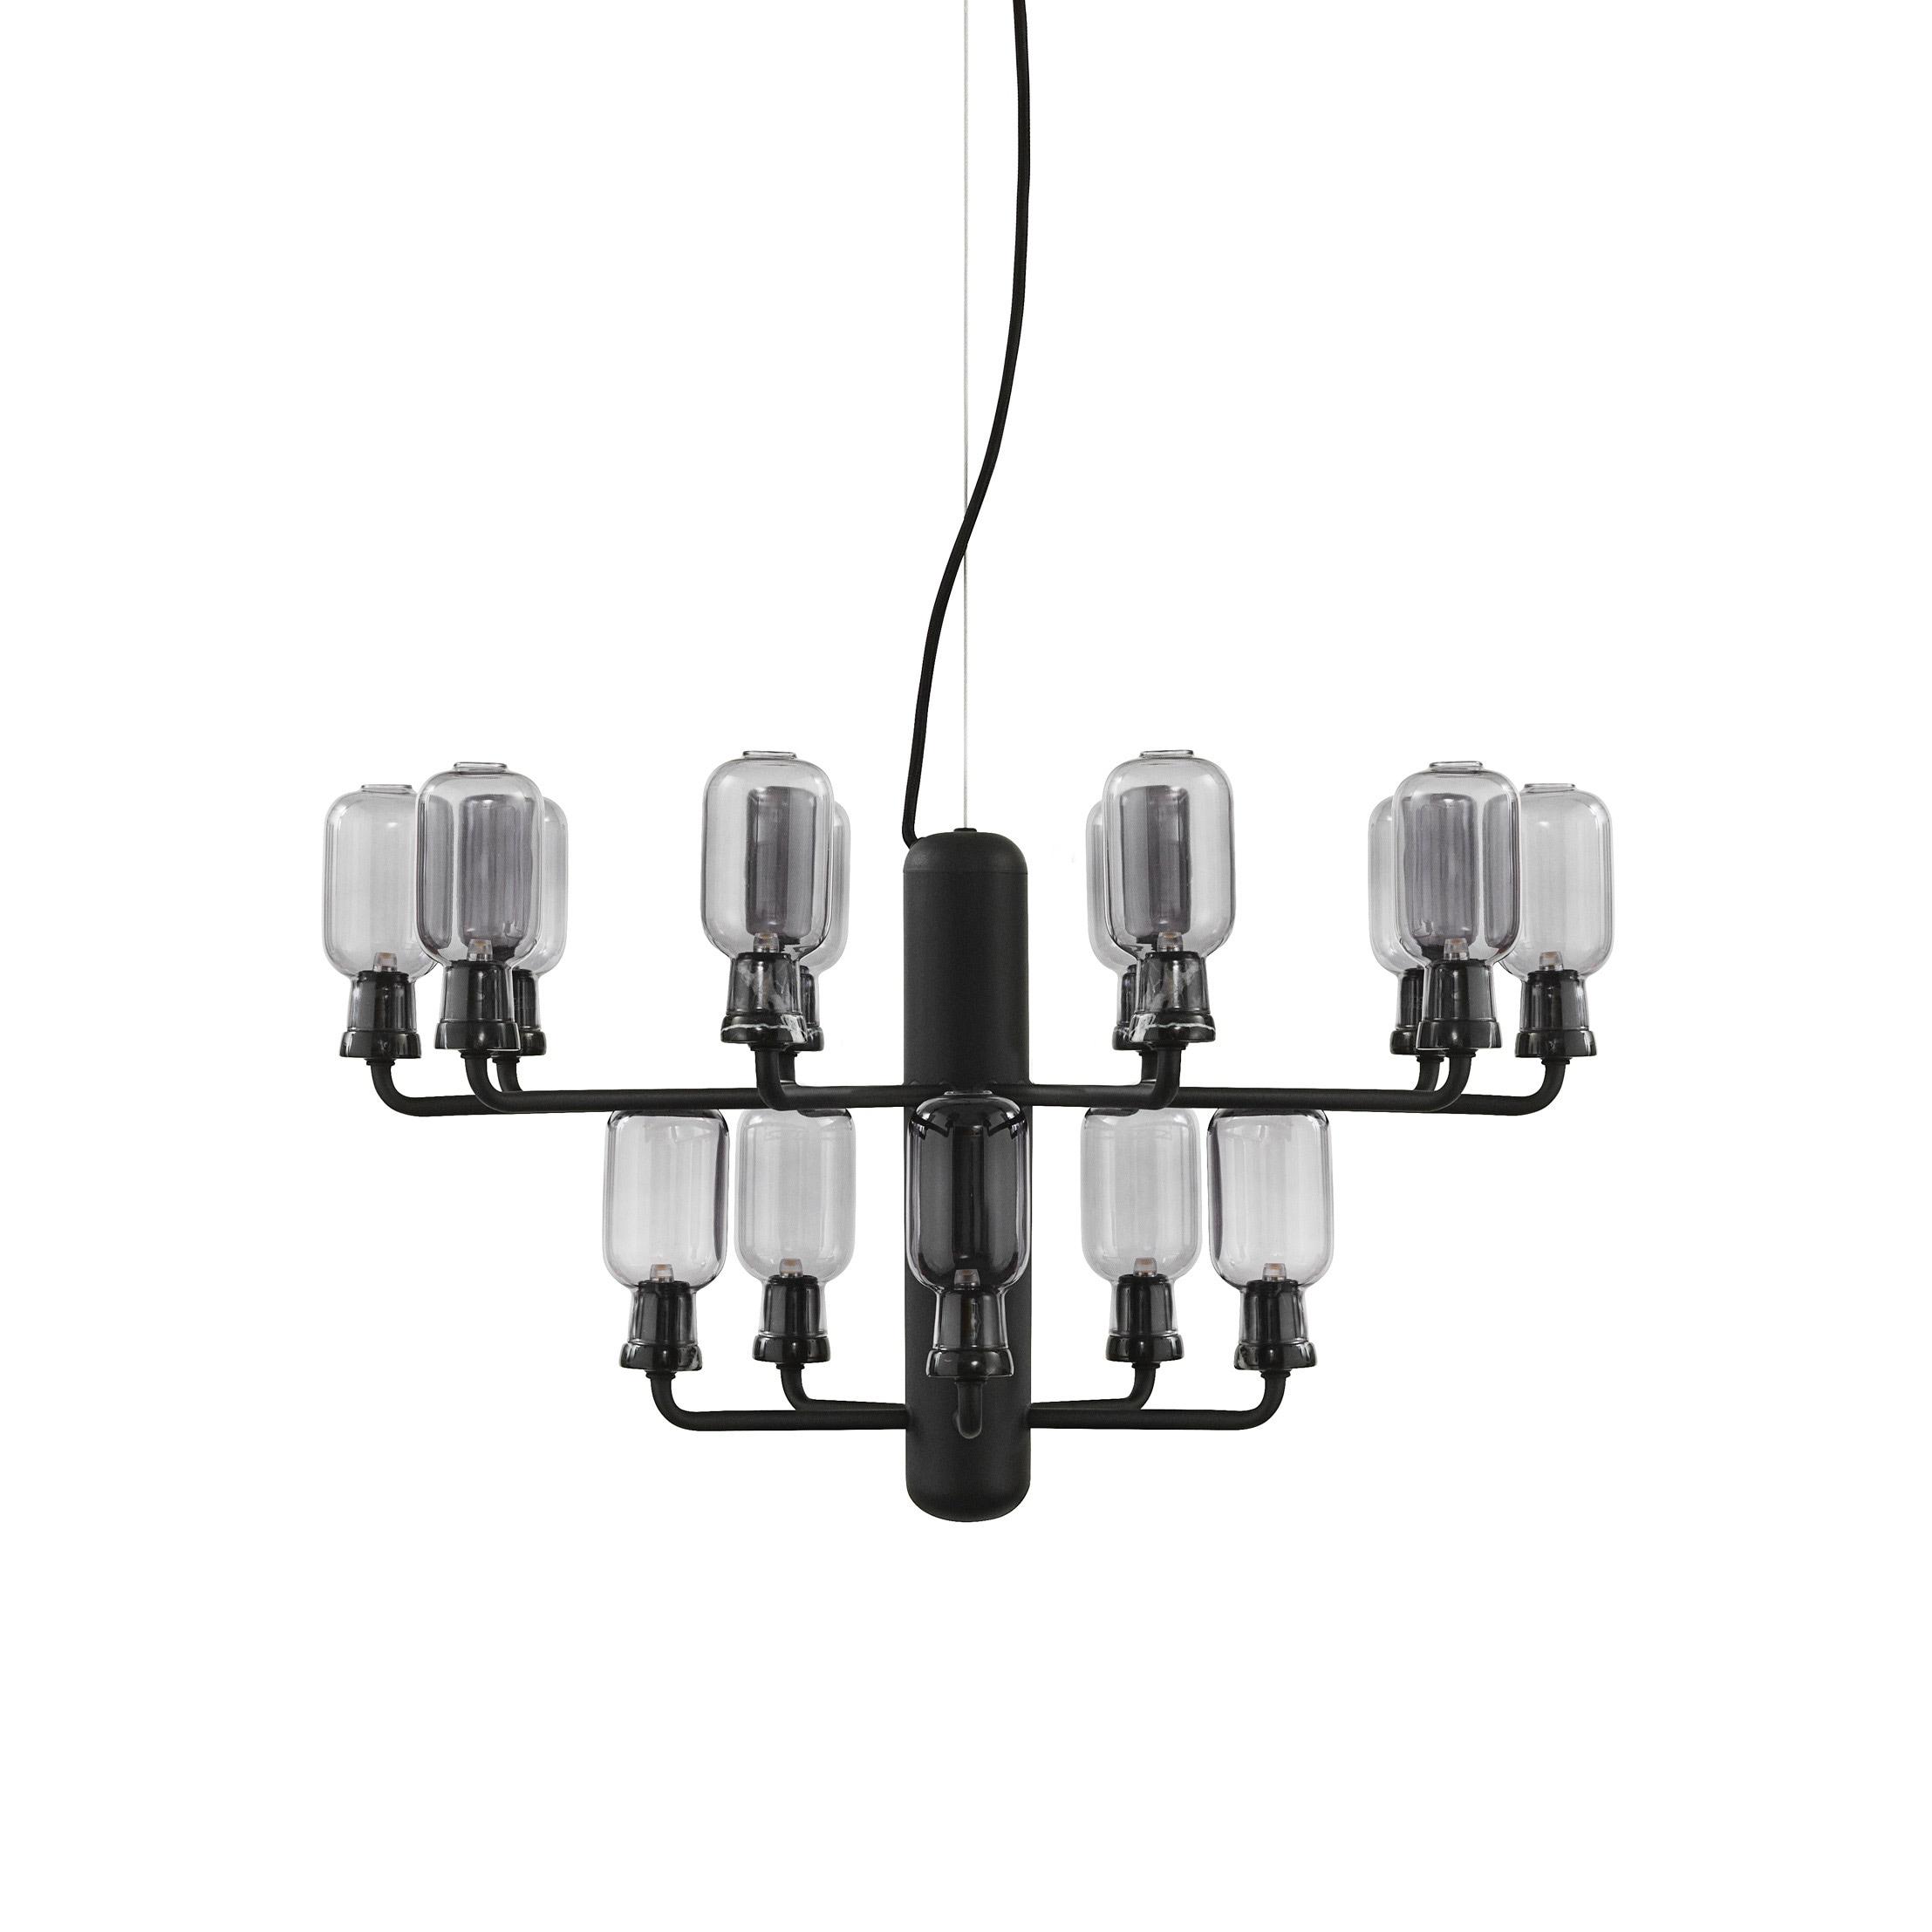 Amp chandelier S smoke/black